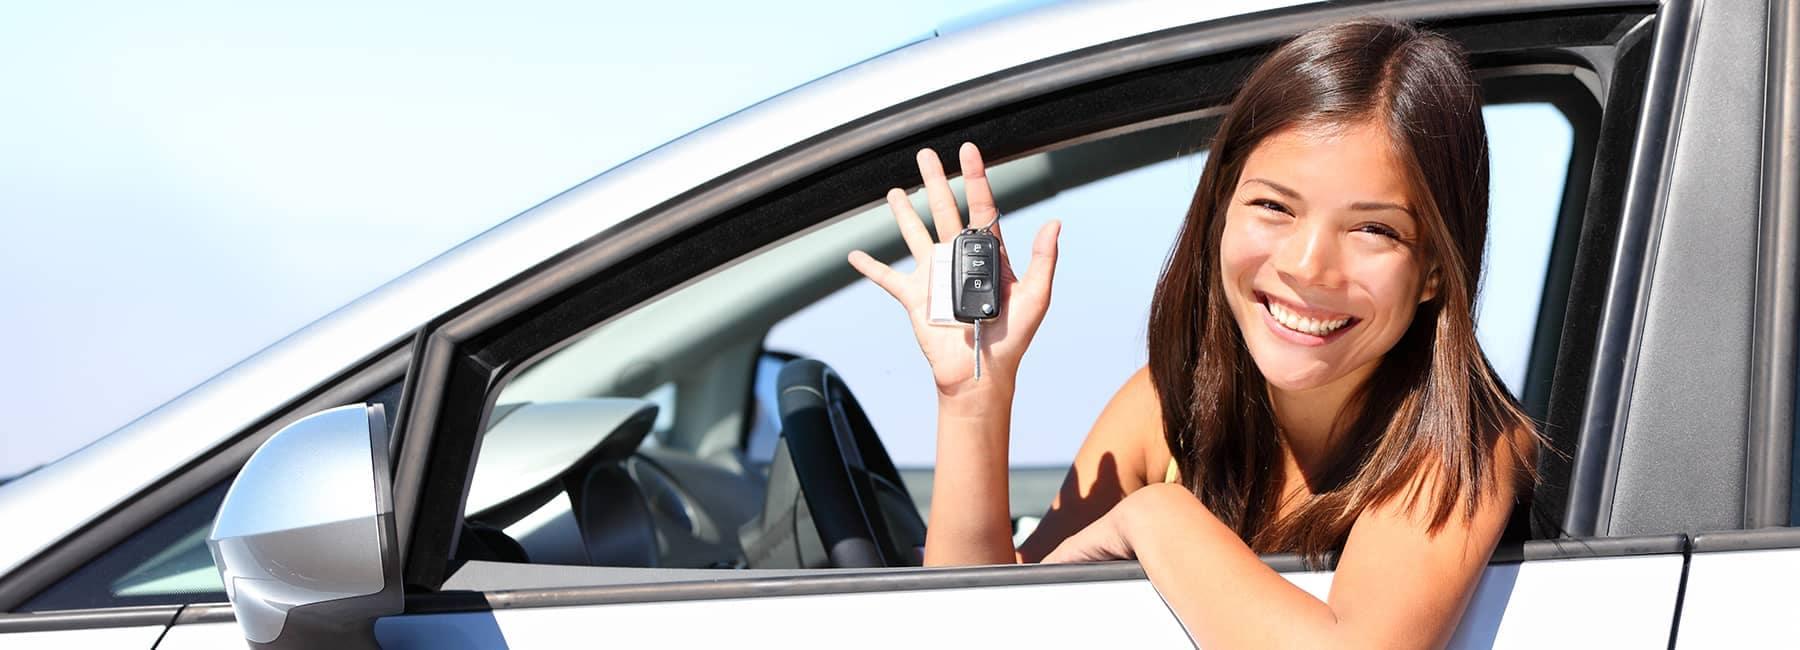 happy woman holds new car keys